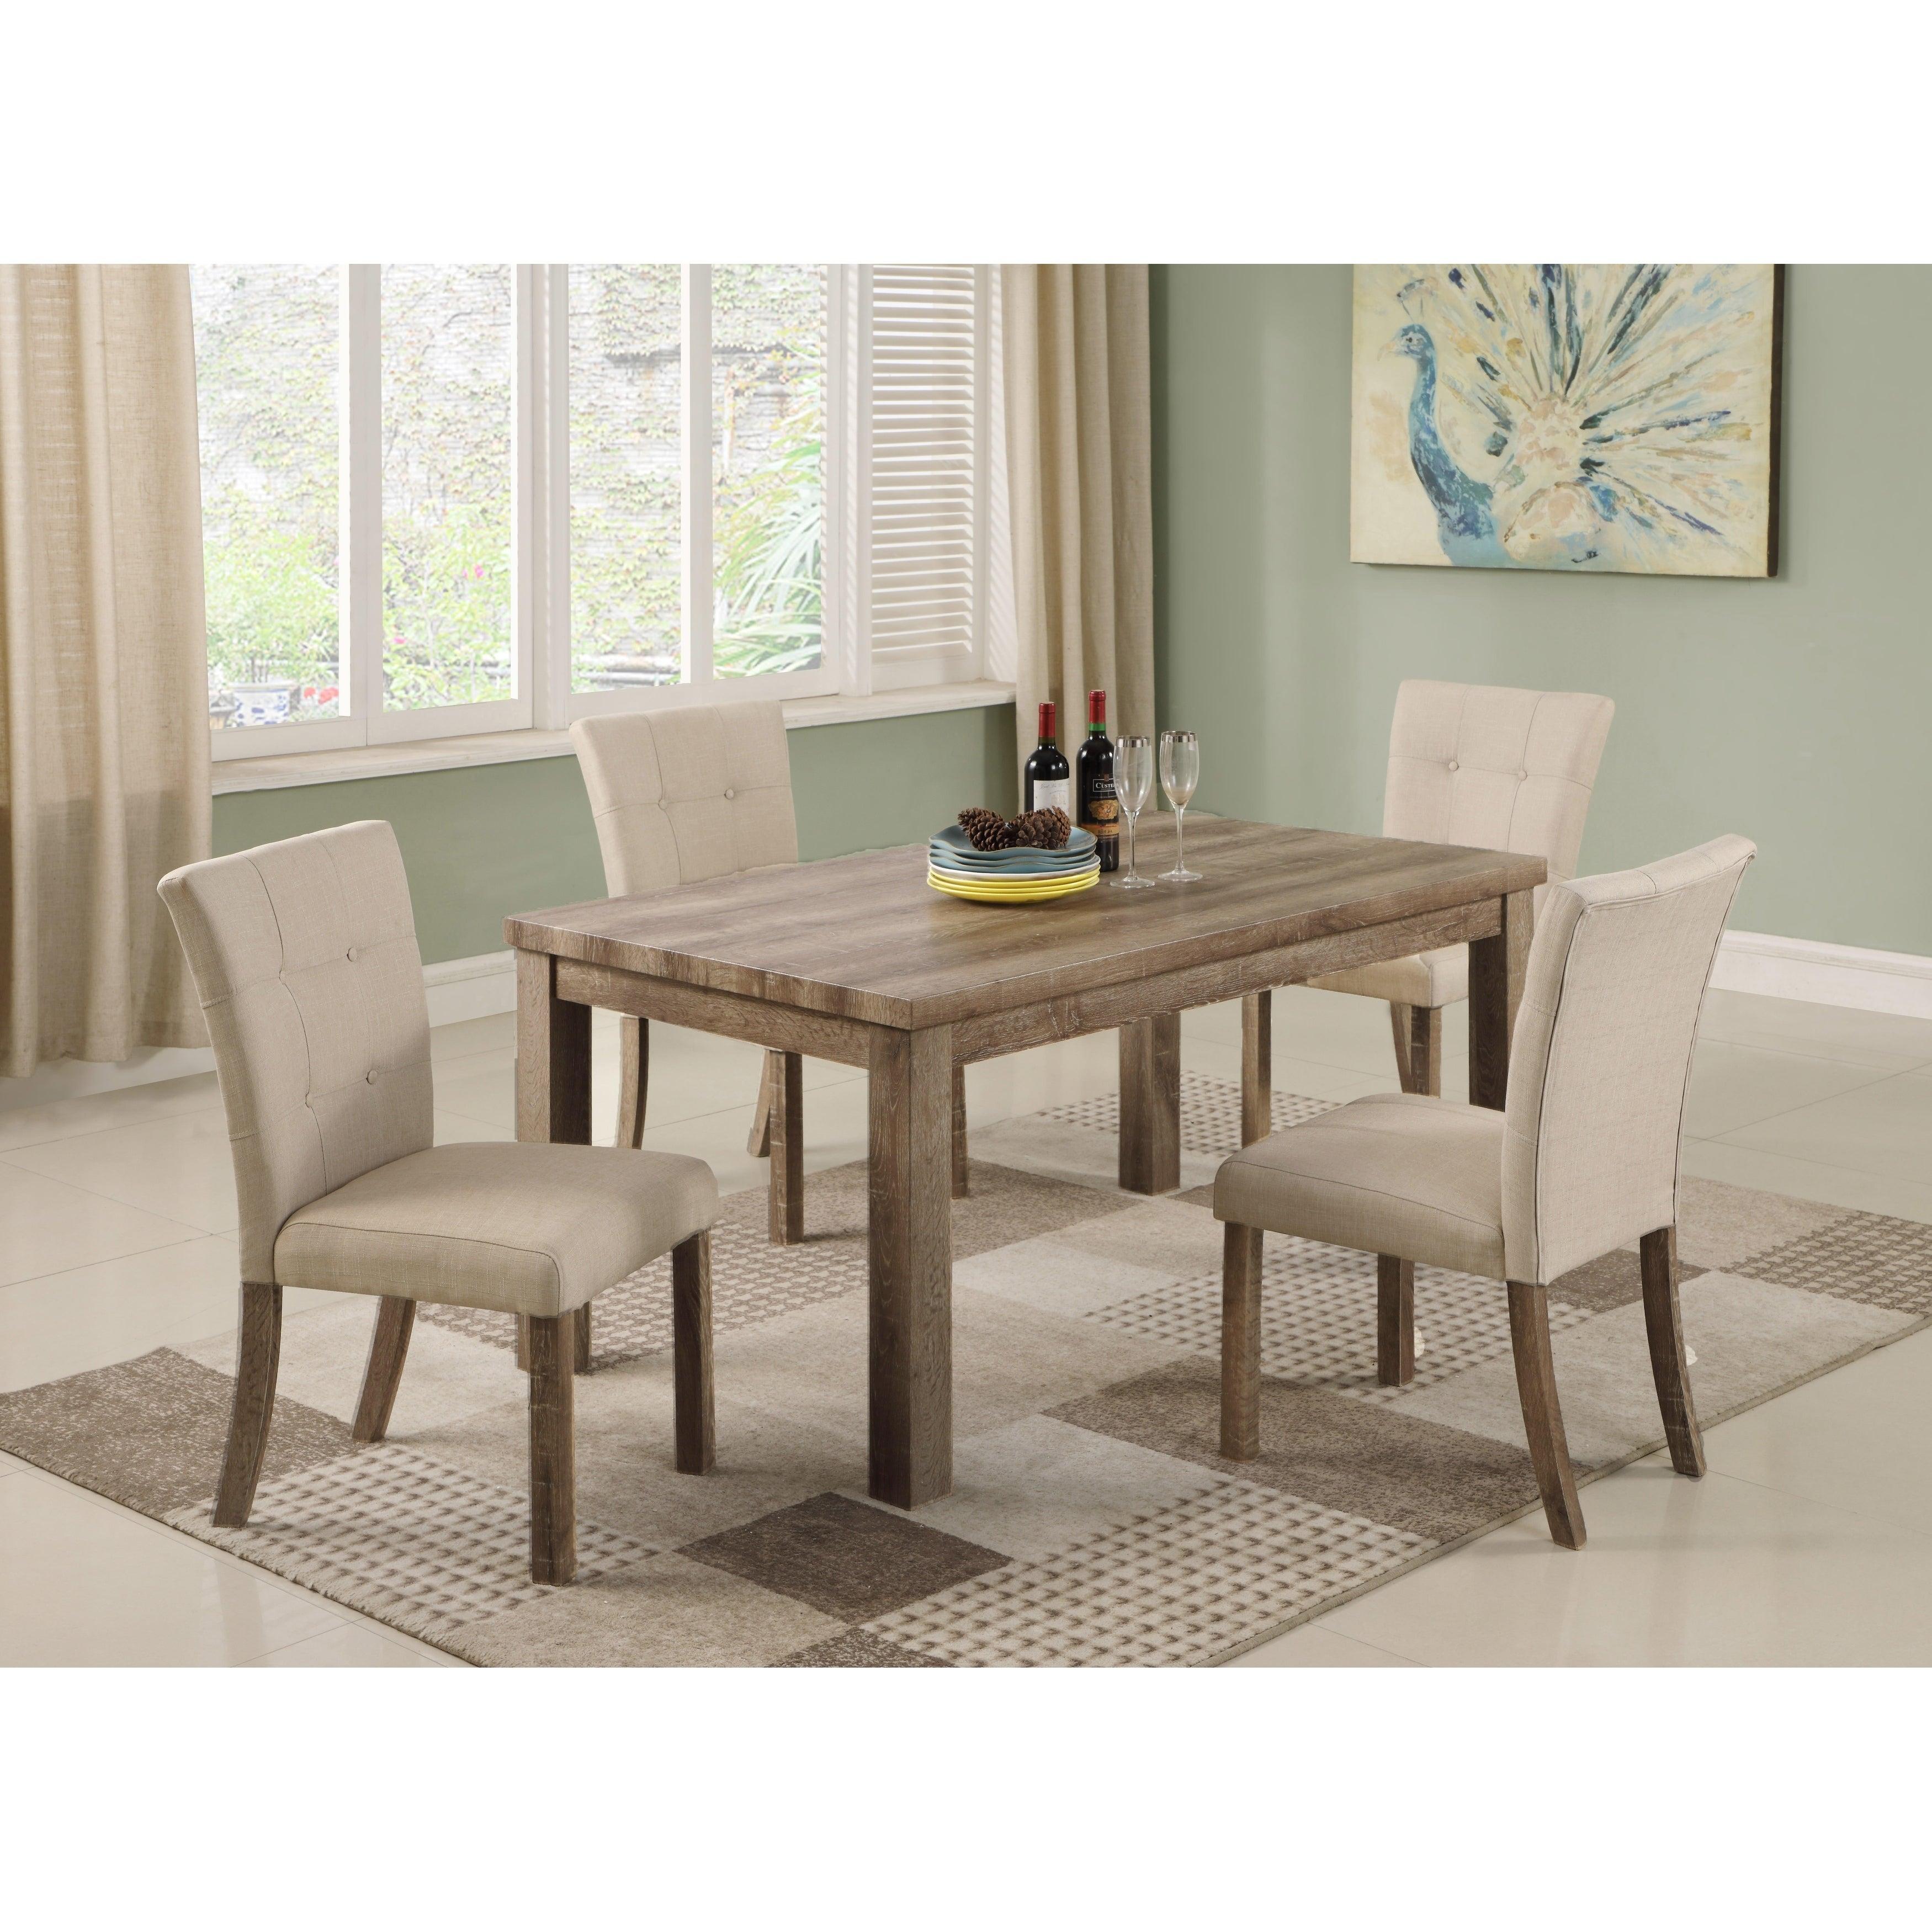 Best Master Furniture Light Wood 5